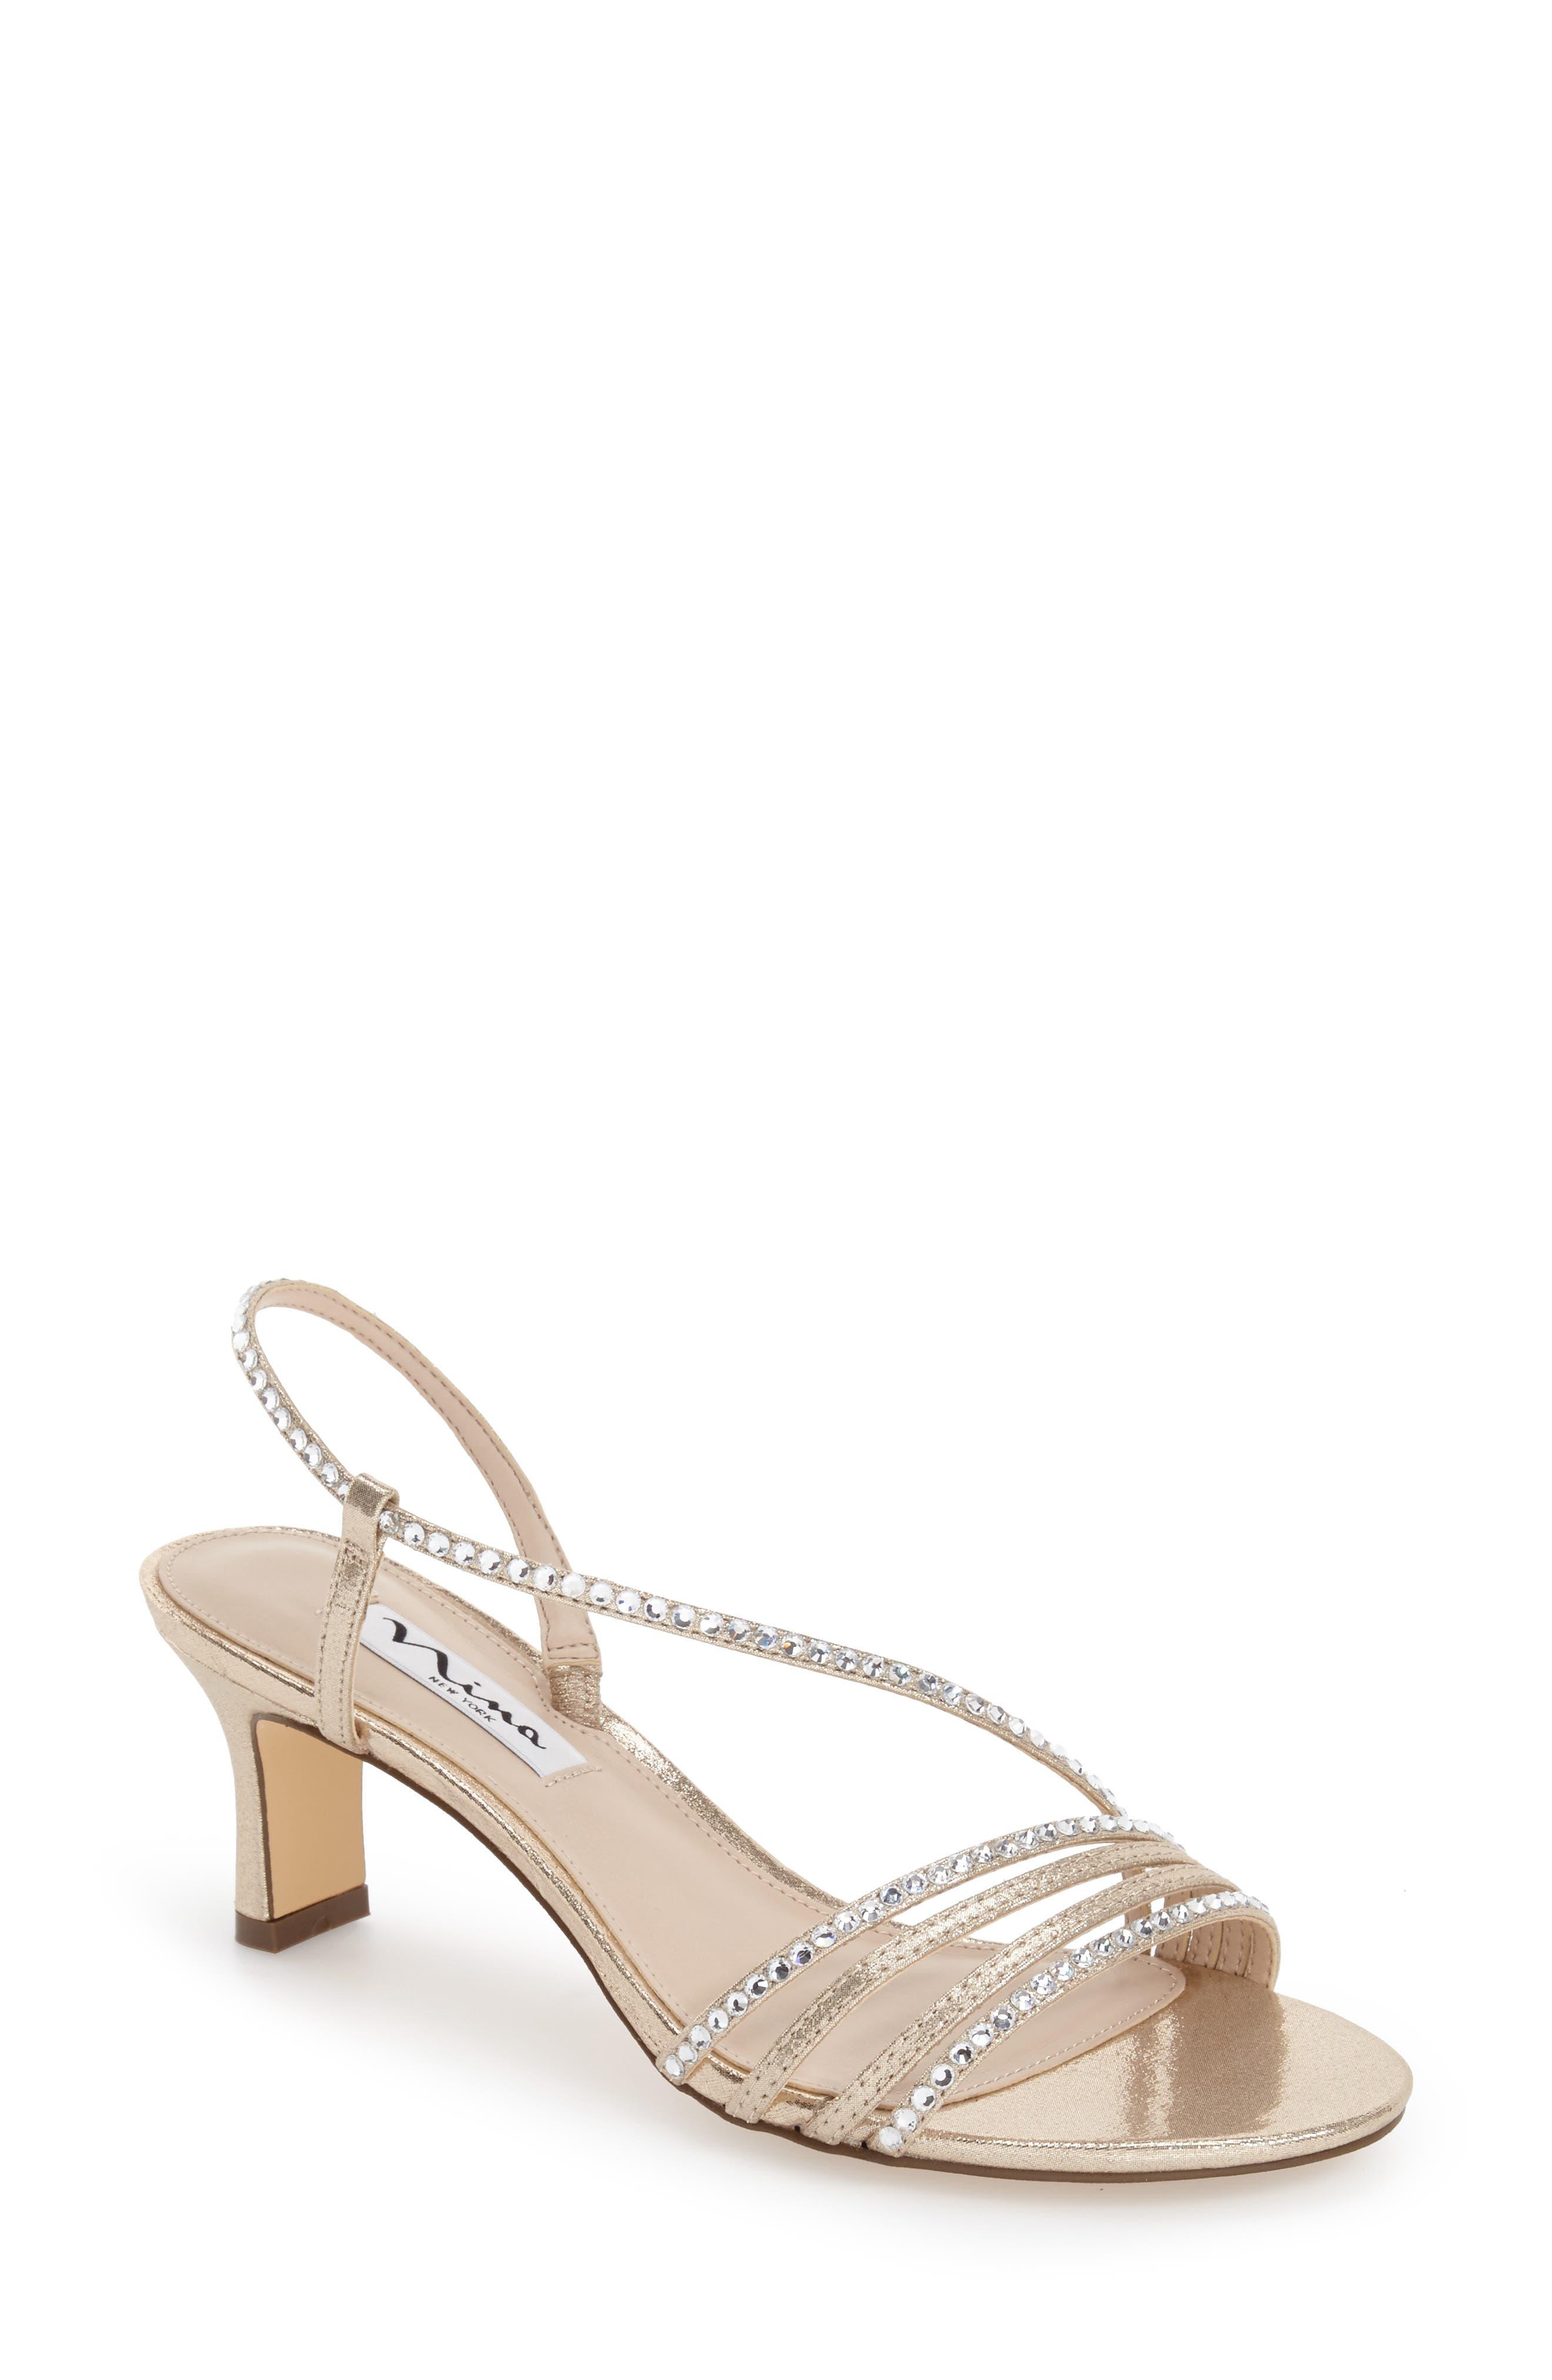 'Gerri' Embellished Slingback Sandal,                             Main thumbnail 1, color,                             TAUPE SUEDE